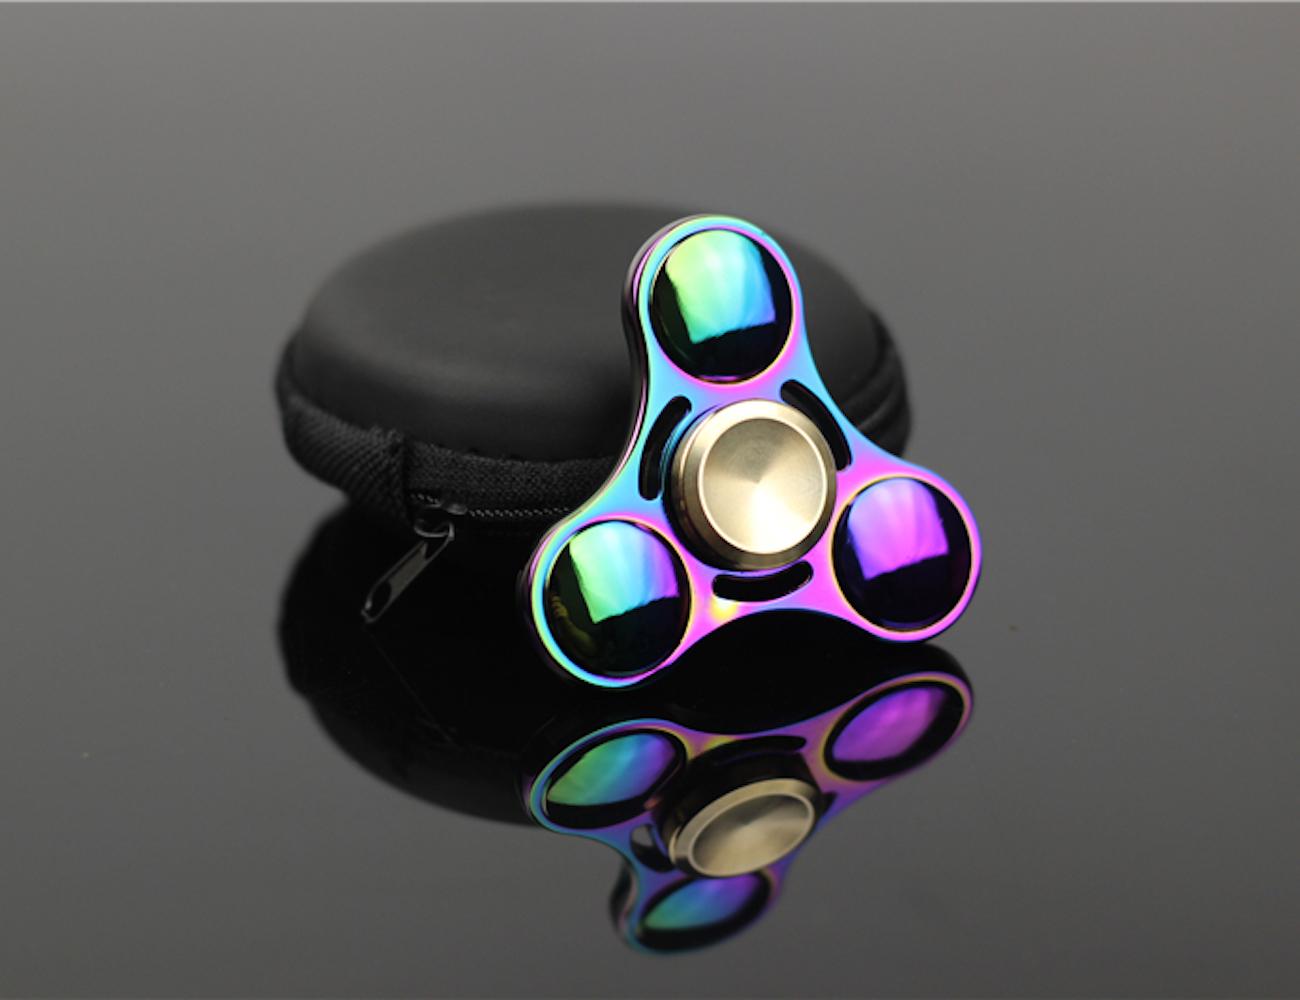 Colorfully Patterned Fidget Spinner